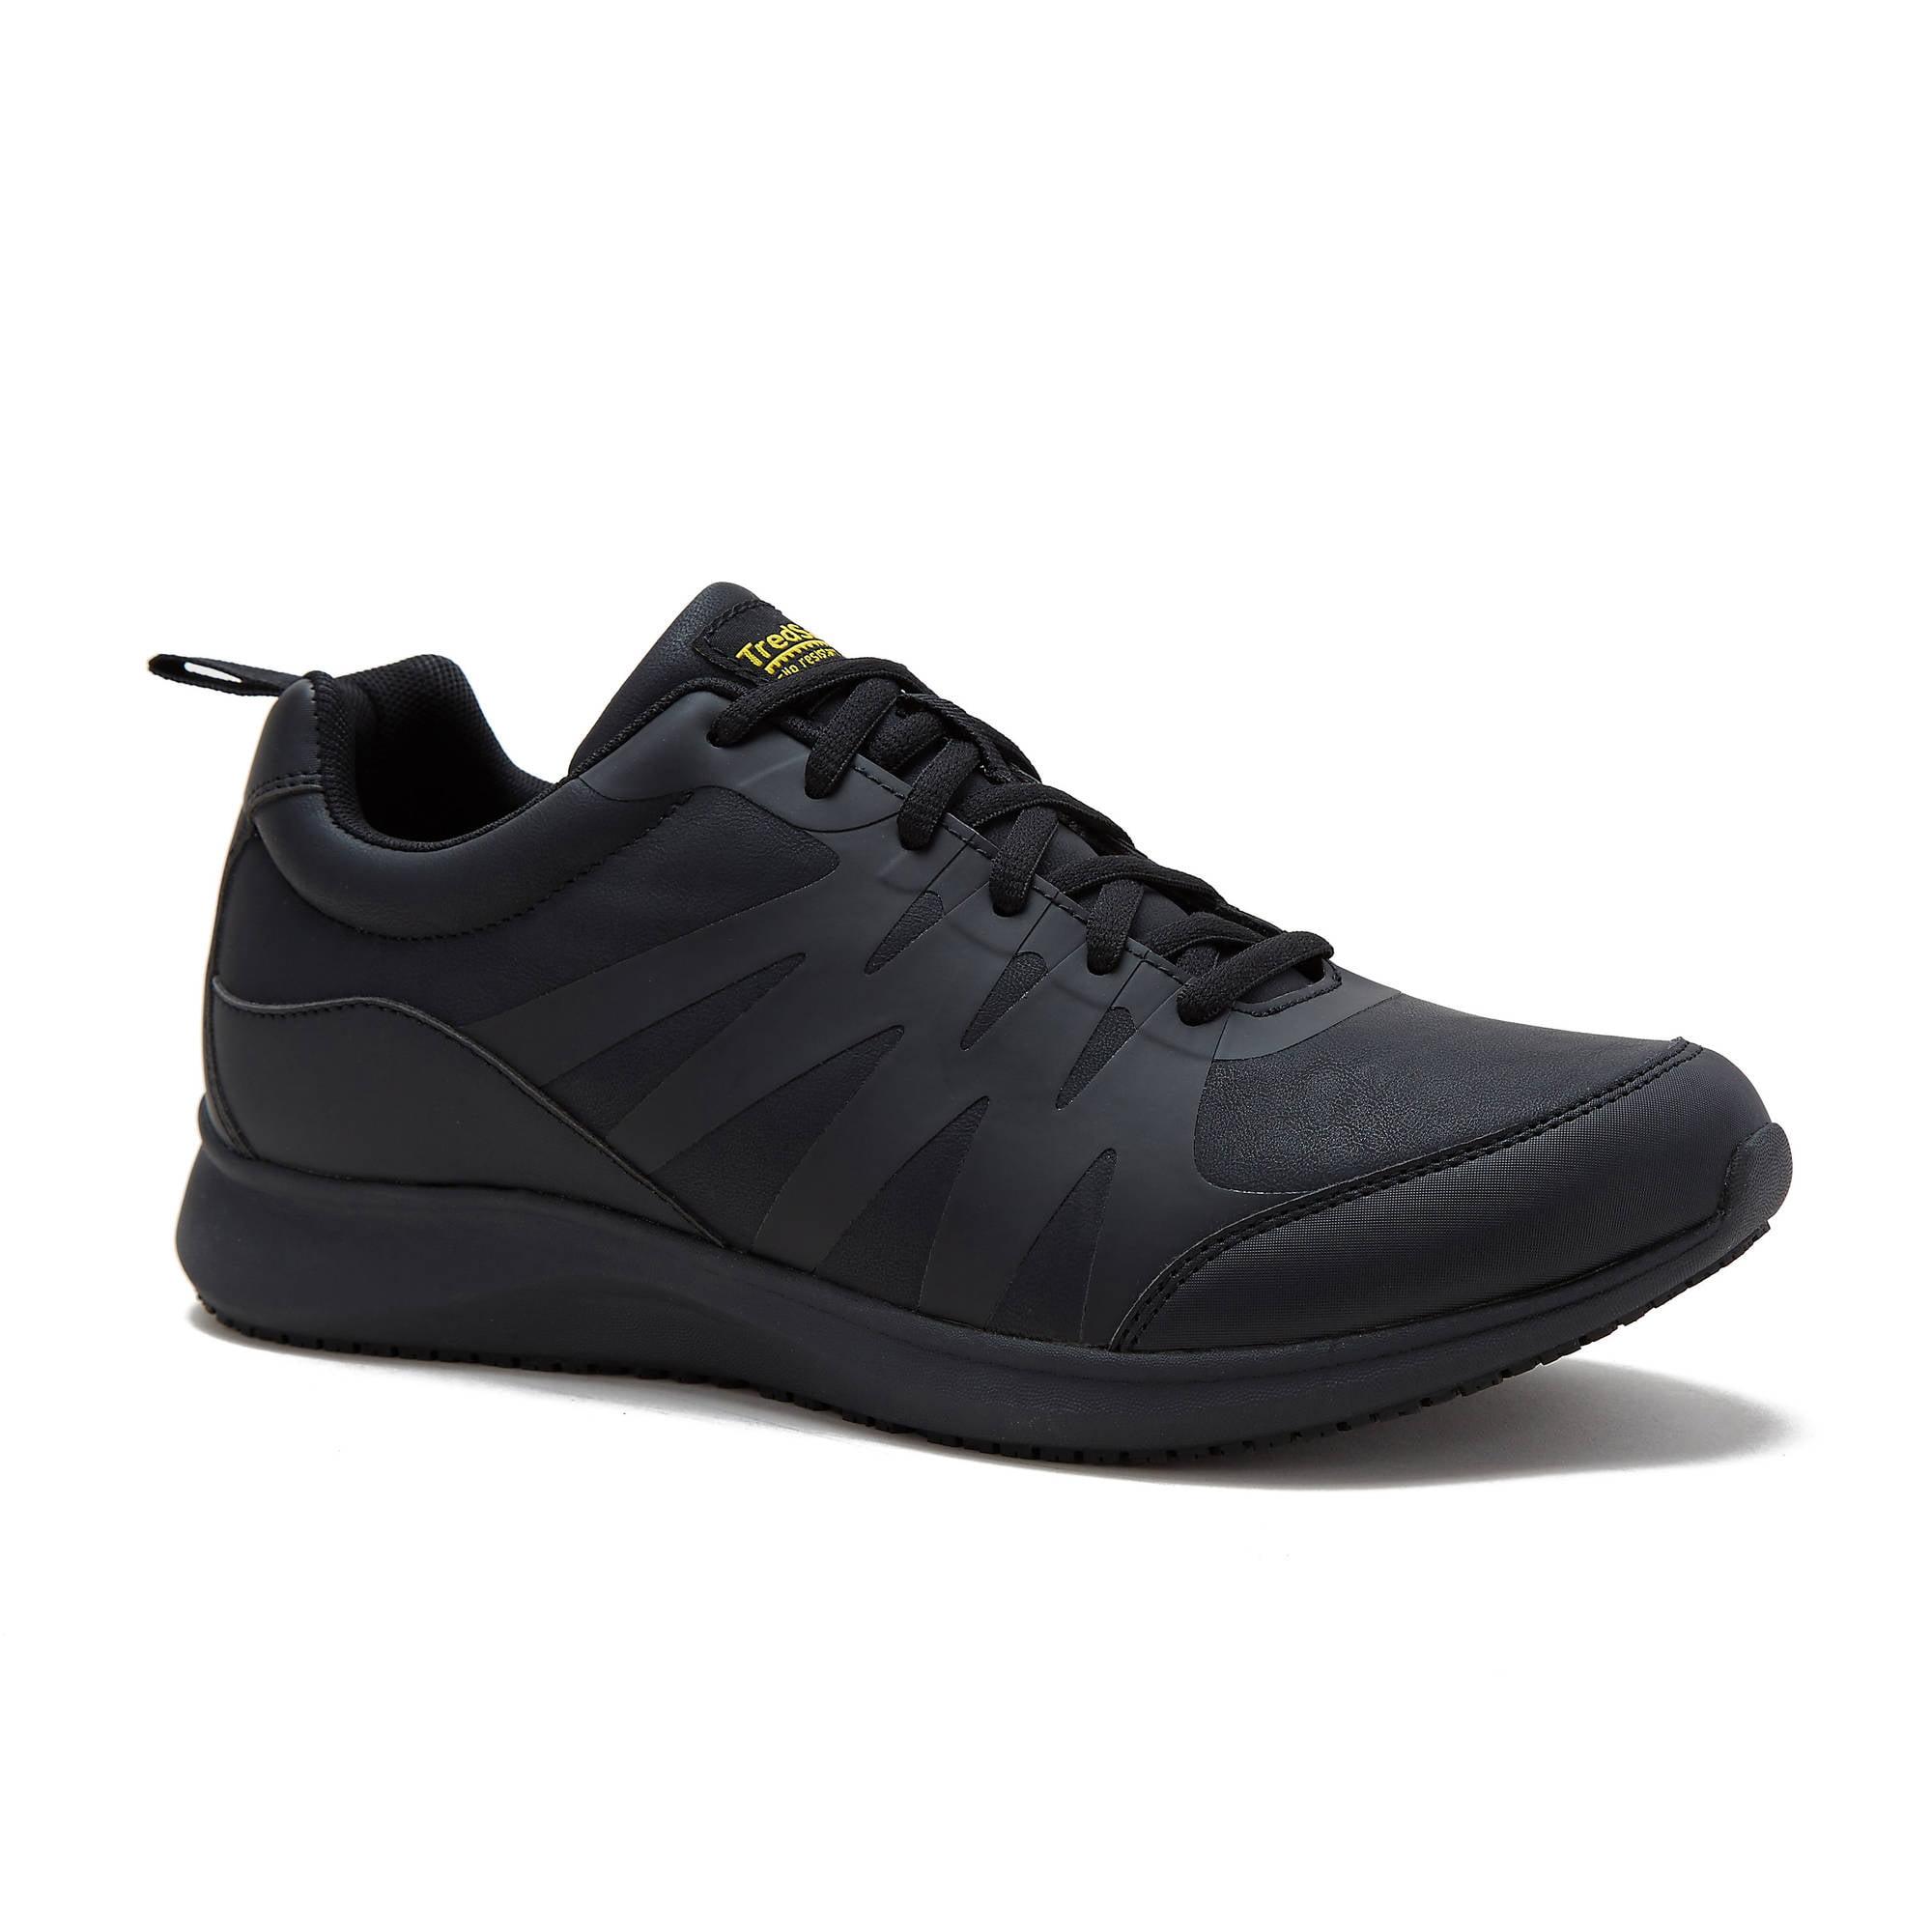 Tredsafe Men's Nitro Slip Resistant Shoe by